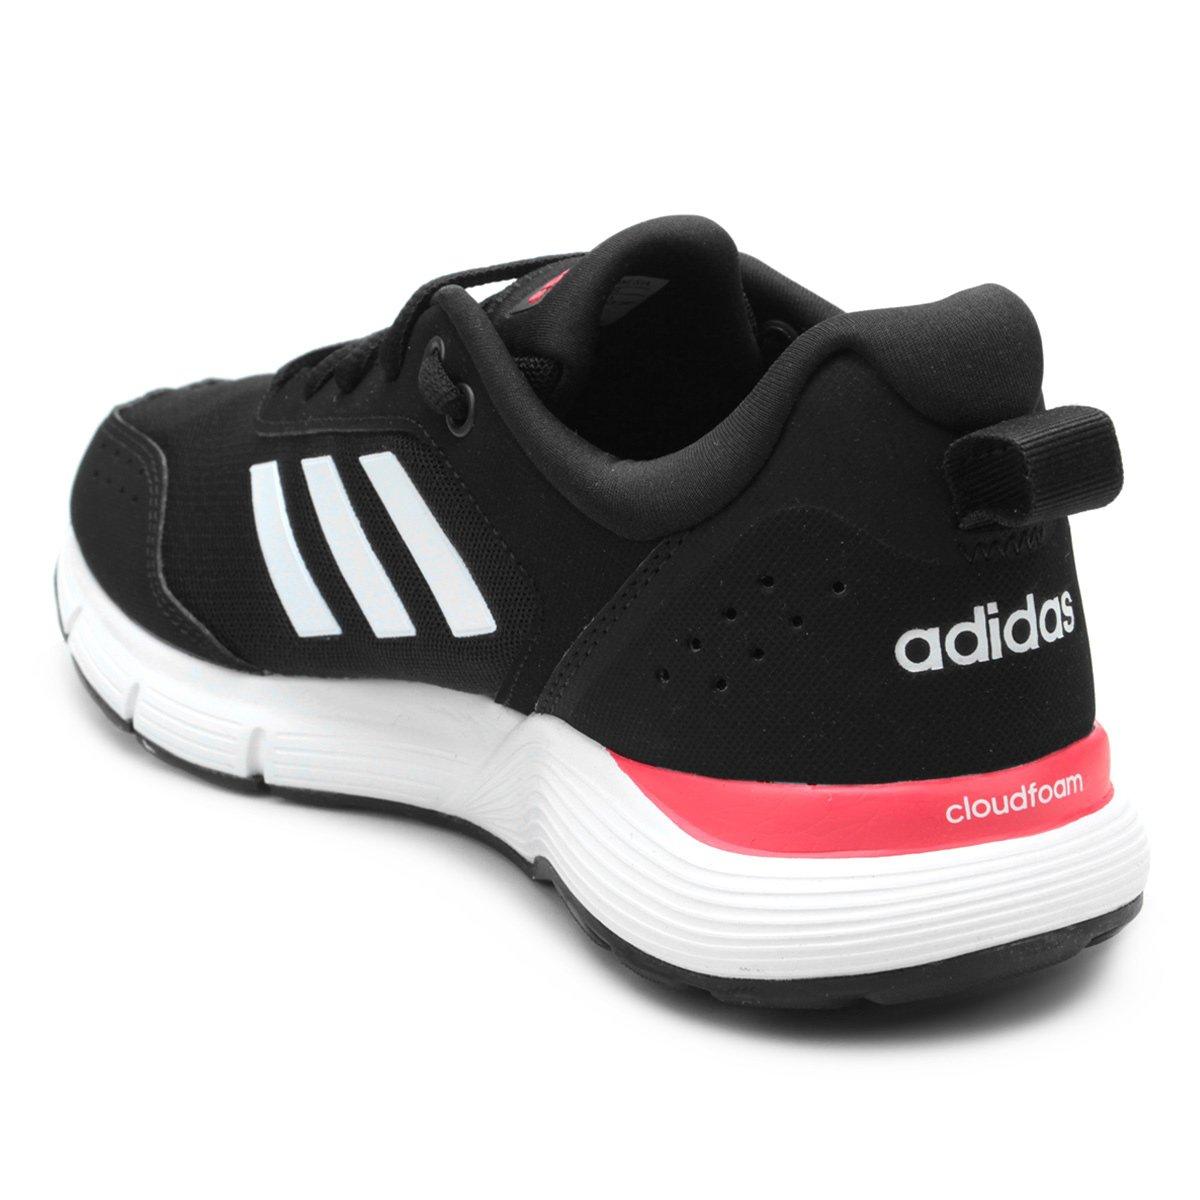 eaff09b2cf Tênis Adidas Fluidcloud Neutral Feminino - Shopping TudoAzul